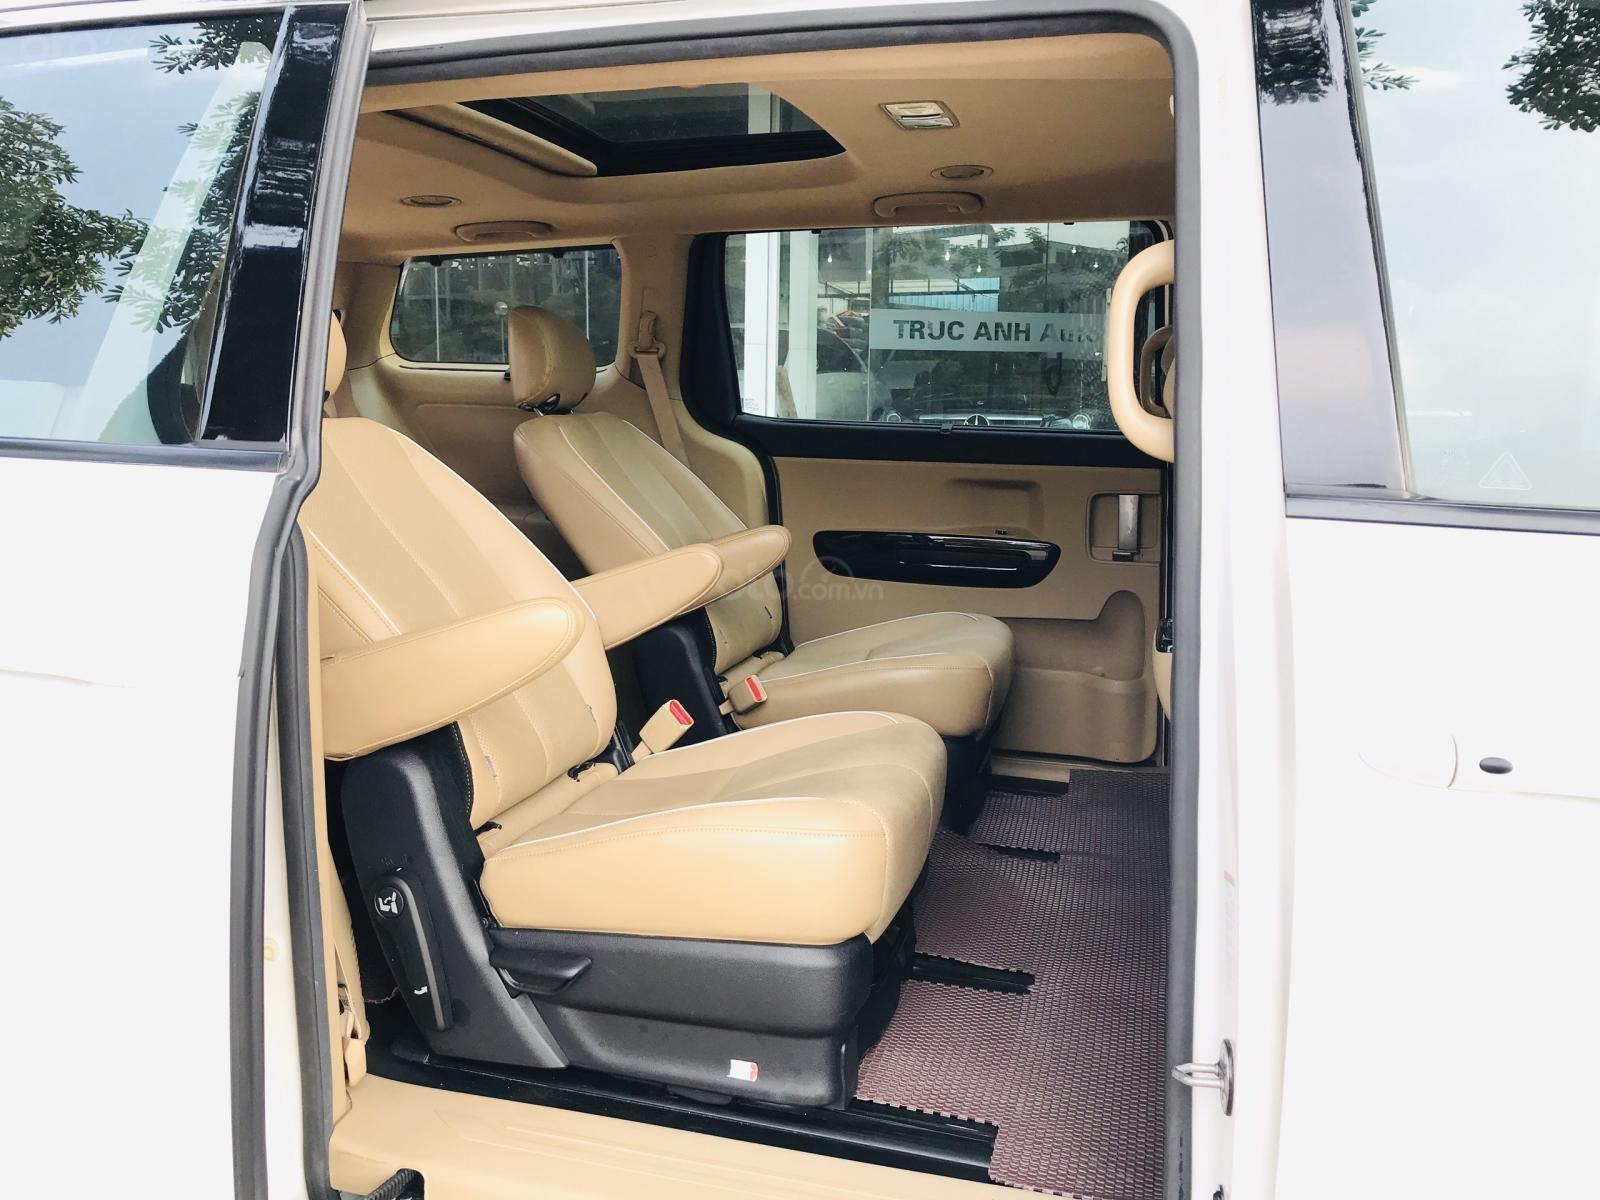 Kia Grand Sedona CRDI modo 2018, máy dầu bản cao cấp nhất, phun kịch option (23)